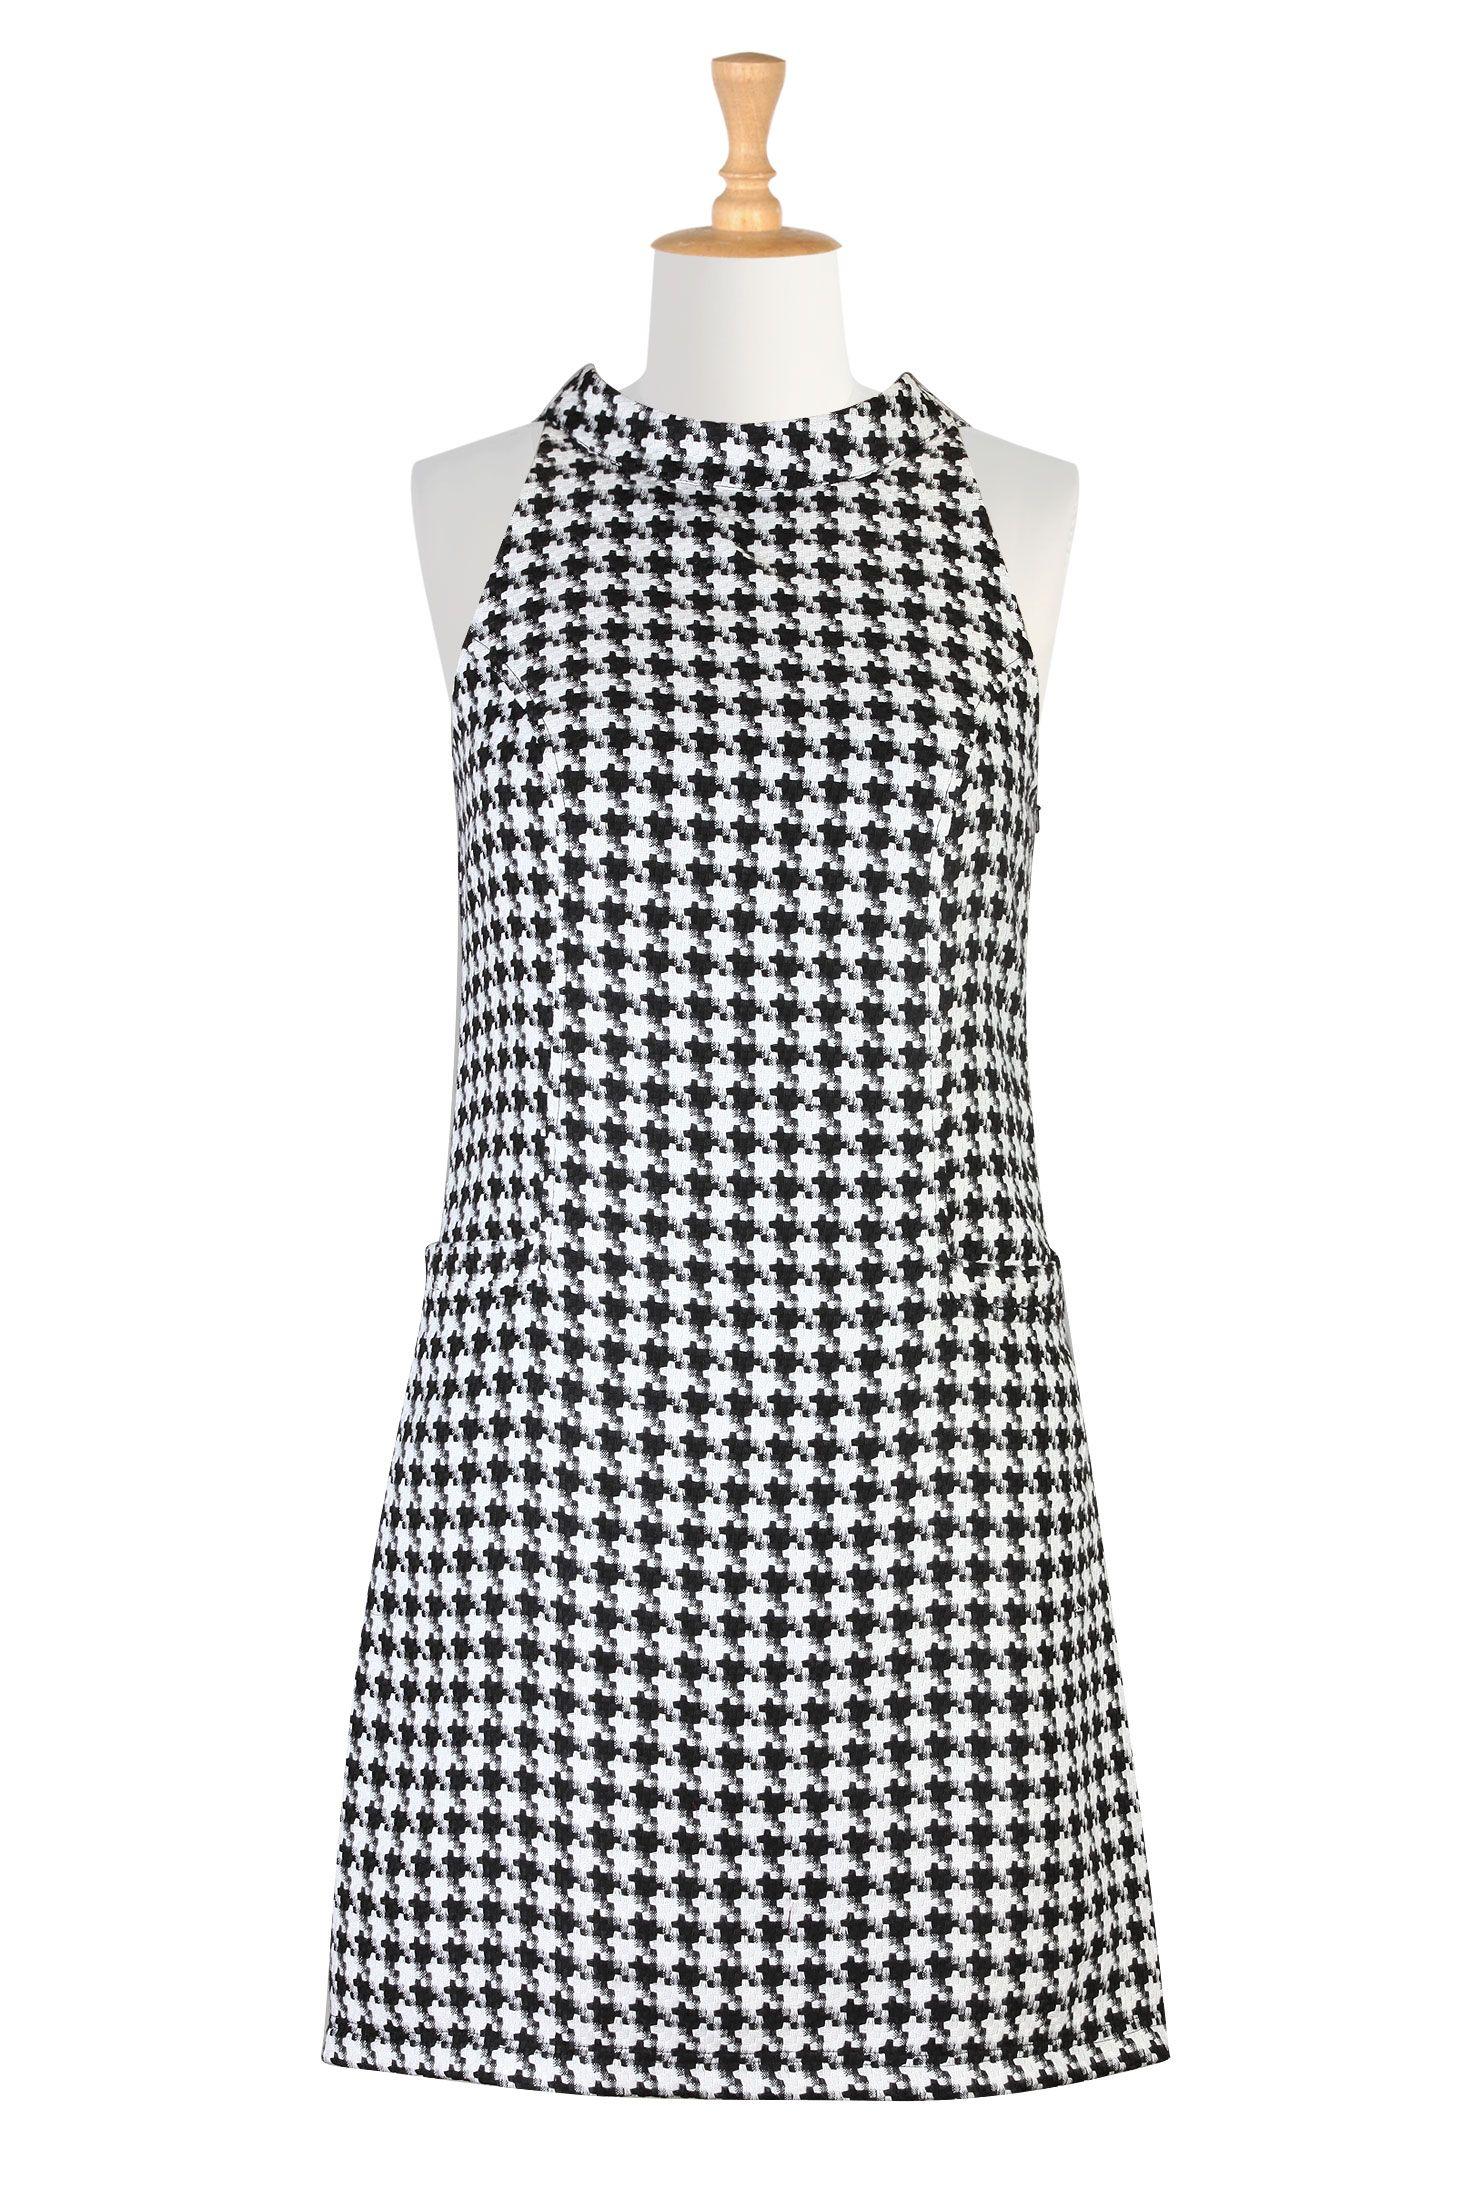 60s Plus Size Retro Dresses Clothing Costumes 1960s Style